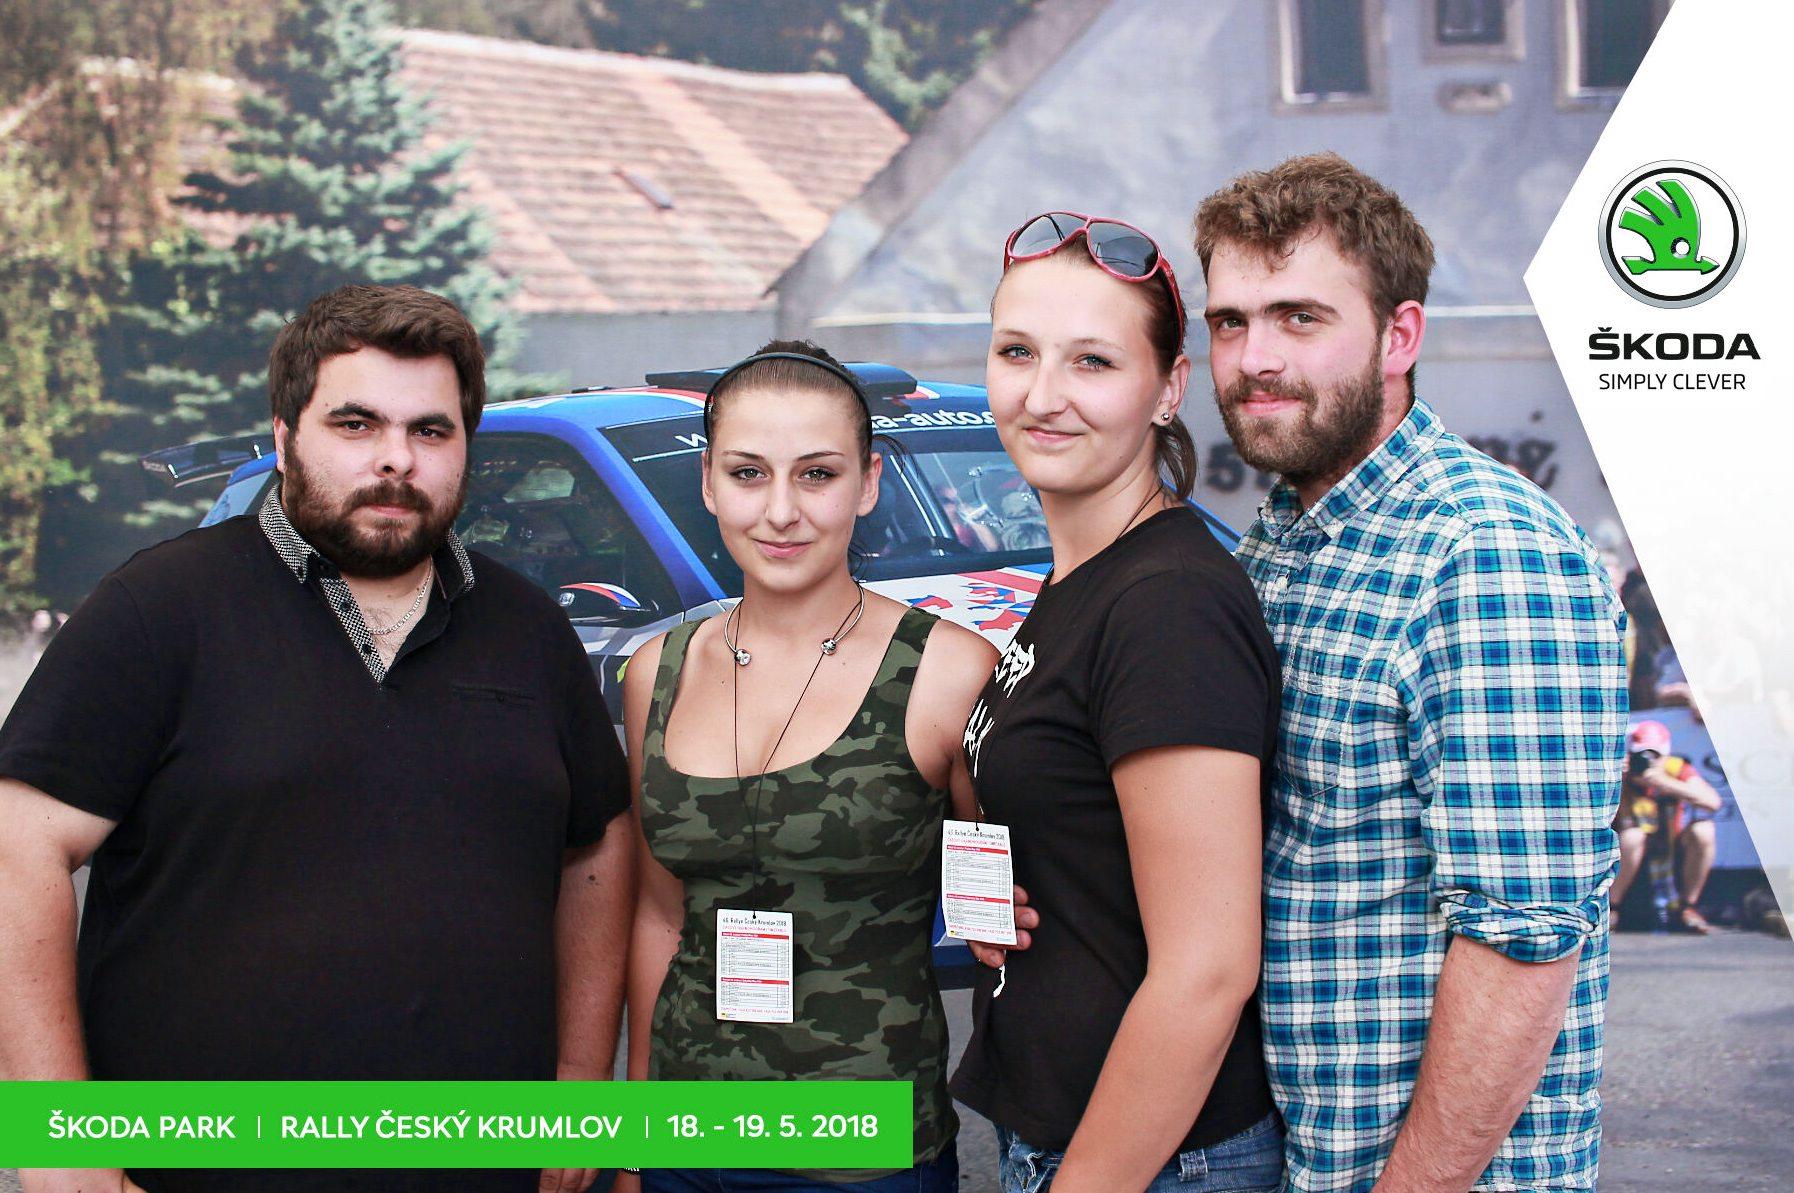 fotokoutek-skoda-park-rally-cesky-krumlov-19-5-2018-419909